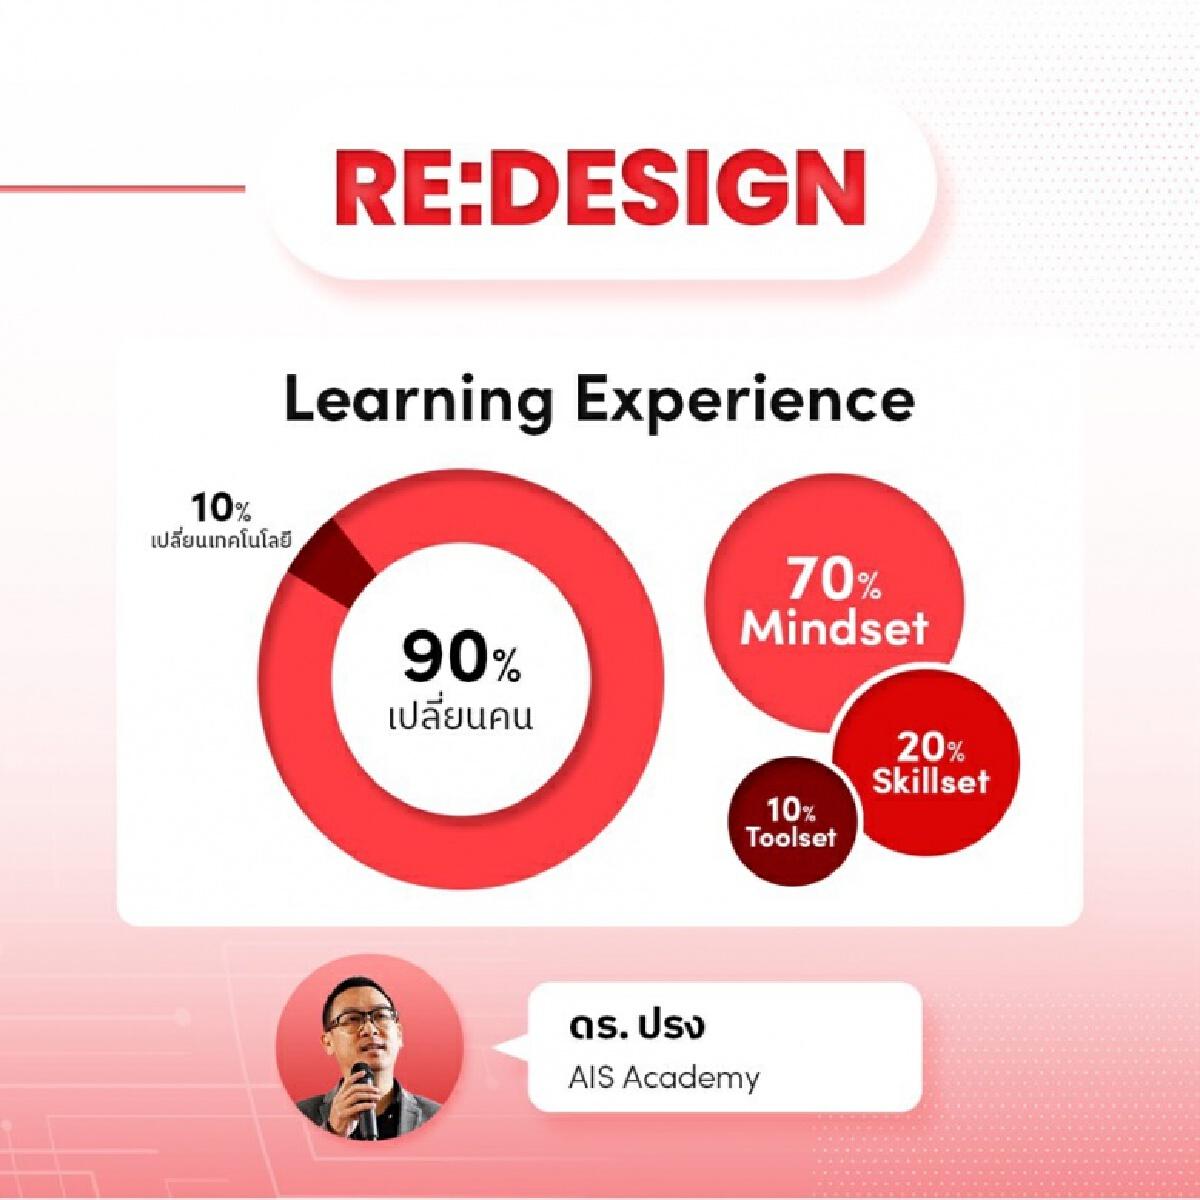 "Conicle เปลี่ยนการเรียนรู้สู่ประสบการณ์ใหม่ ""เพราะการเรียนรู้คือพลังสำคัญ เมื่อเผชิญหน้ากับการเปลี่ยนแปลง"""